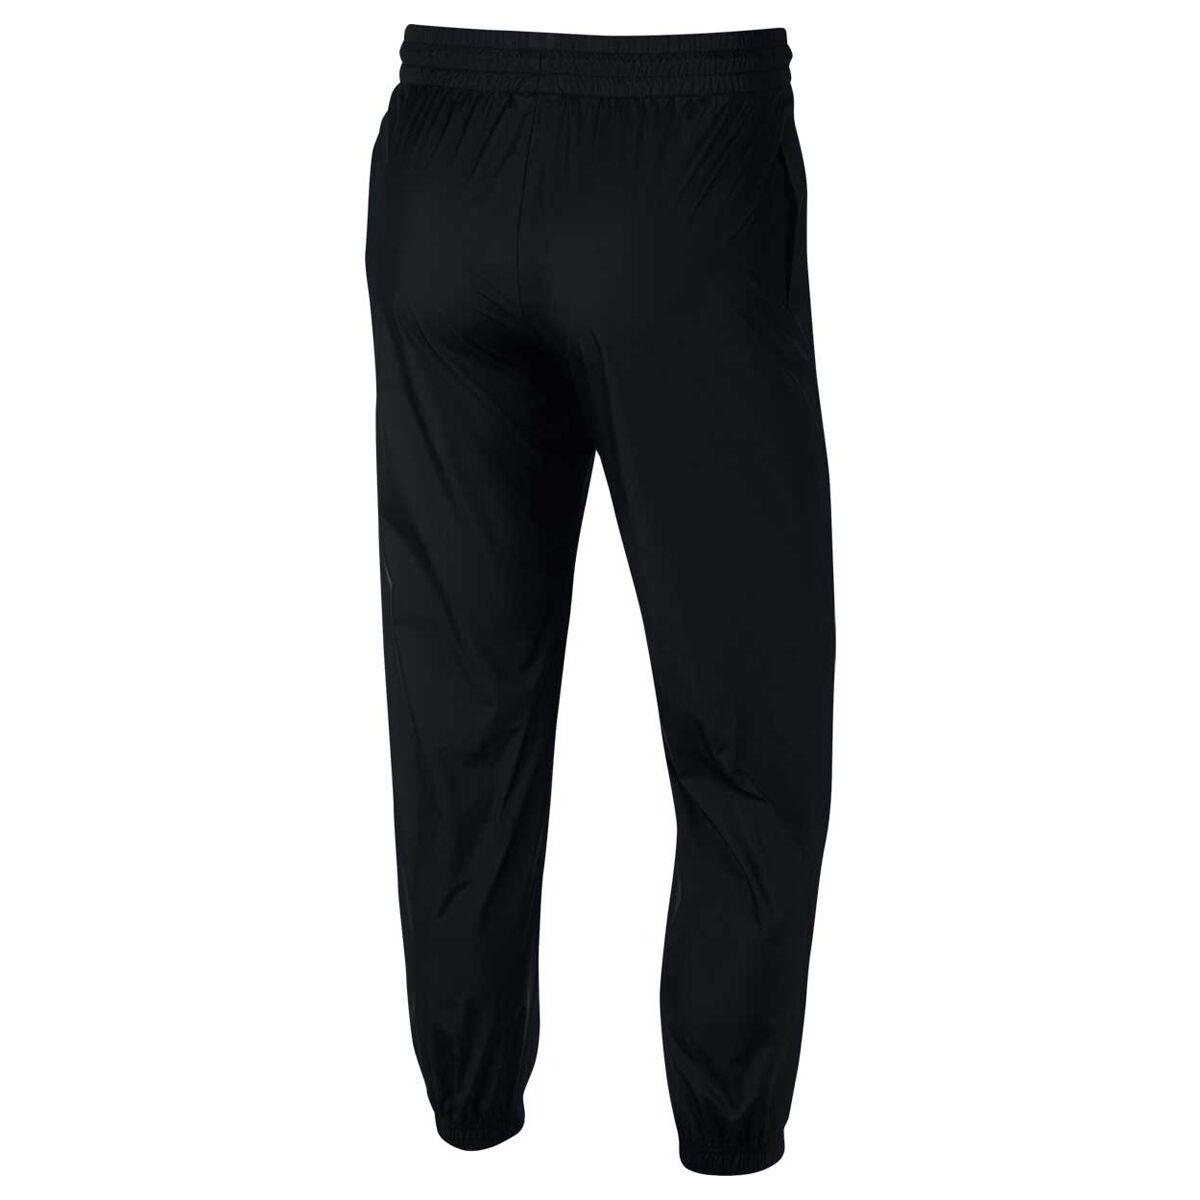 Nike Womens Sportswear Woven Pants Black XL